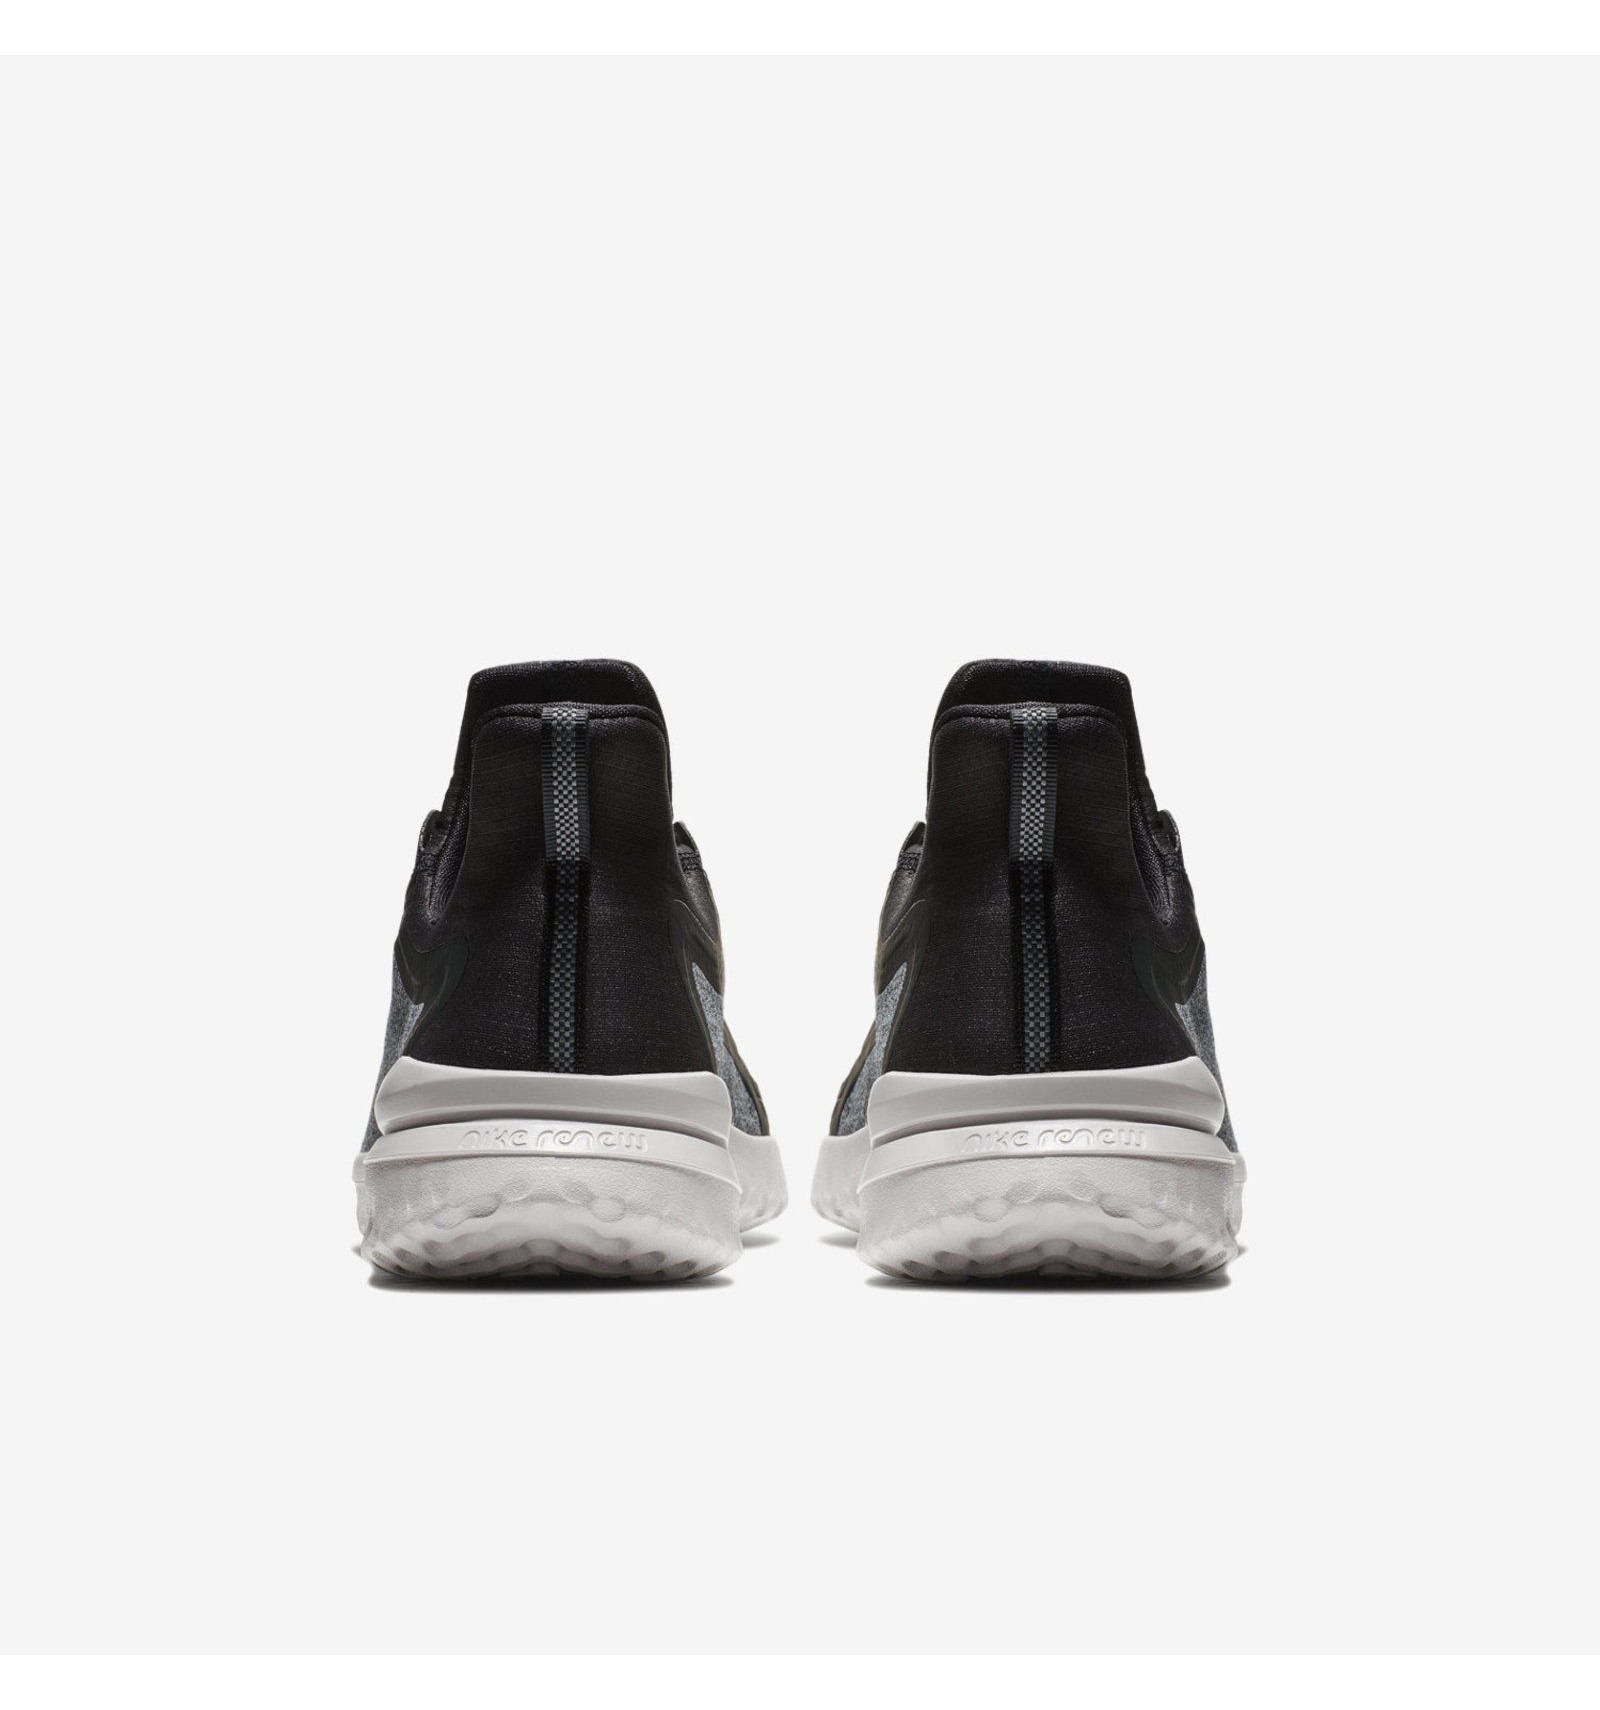 best sneakers 916ee f3bba ZAPATILLA NIKE RENEW RIVAL SHIELD WATER REPELENT - Vicunasport - Tu ...